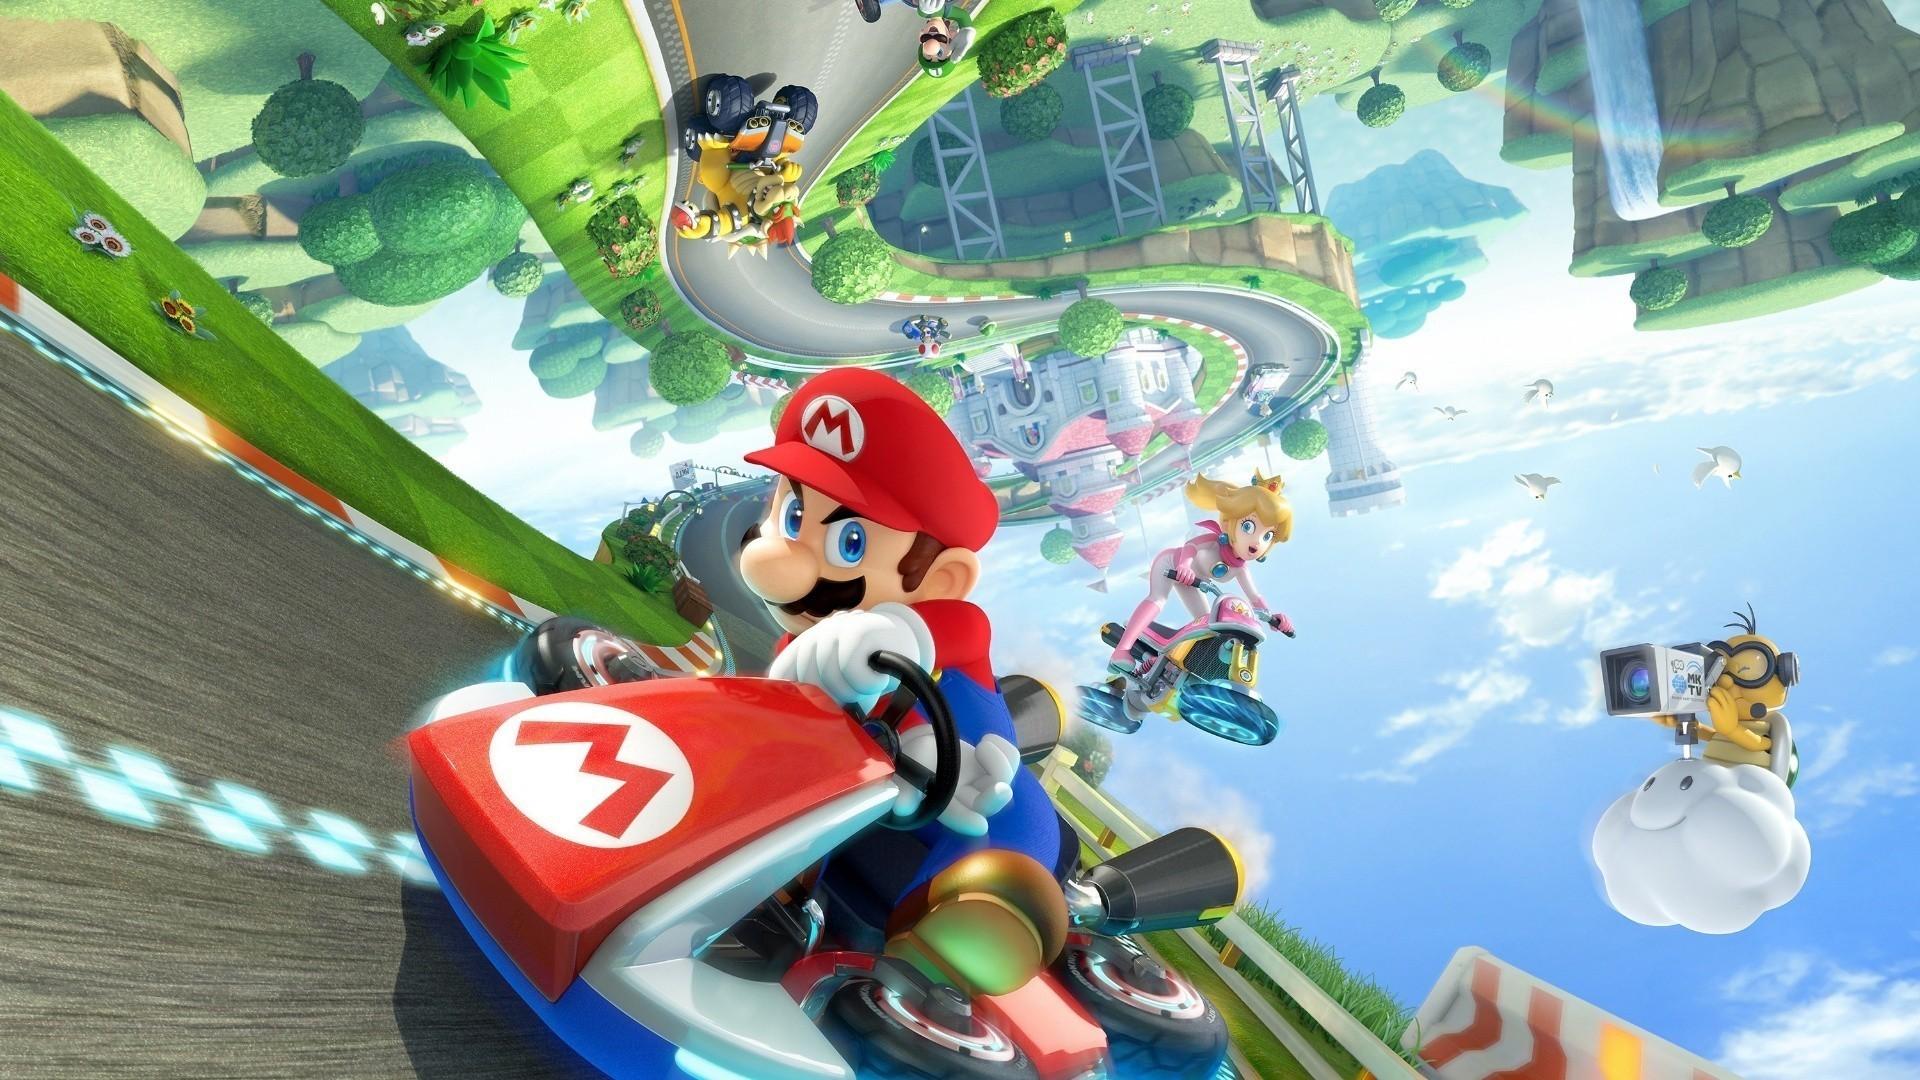 Res: 1920x1080, #Kart, #Princess Peach, #video games, #Mario Kart, #bowser, #Wii U,  #Nintendo, #Super Mario, wallpaper